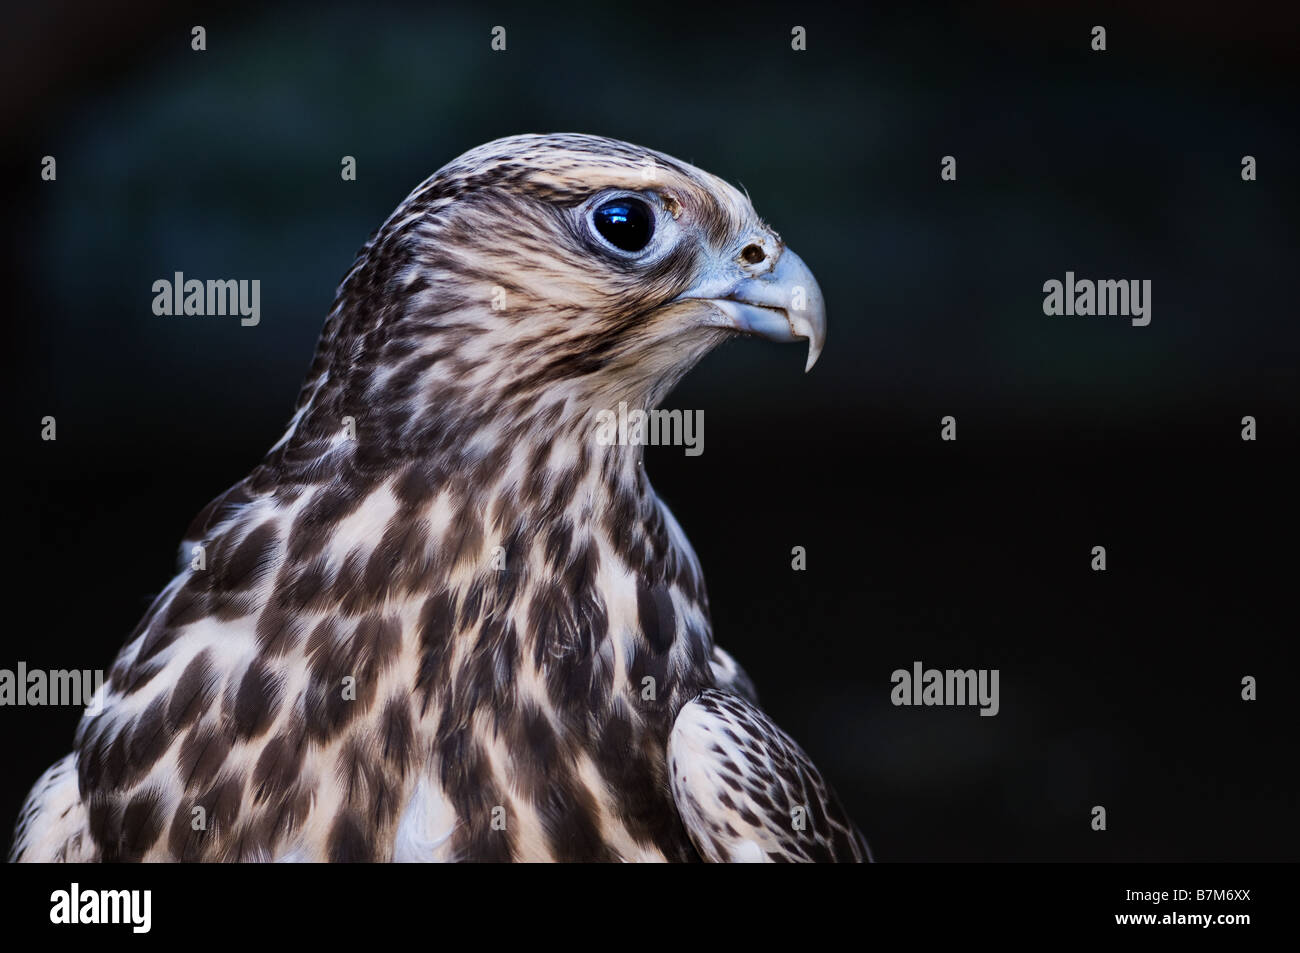 A profile of a female Saker falcon. - Stock Image